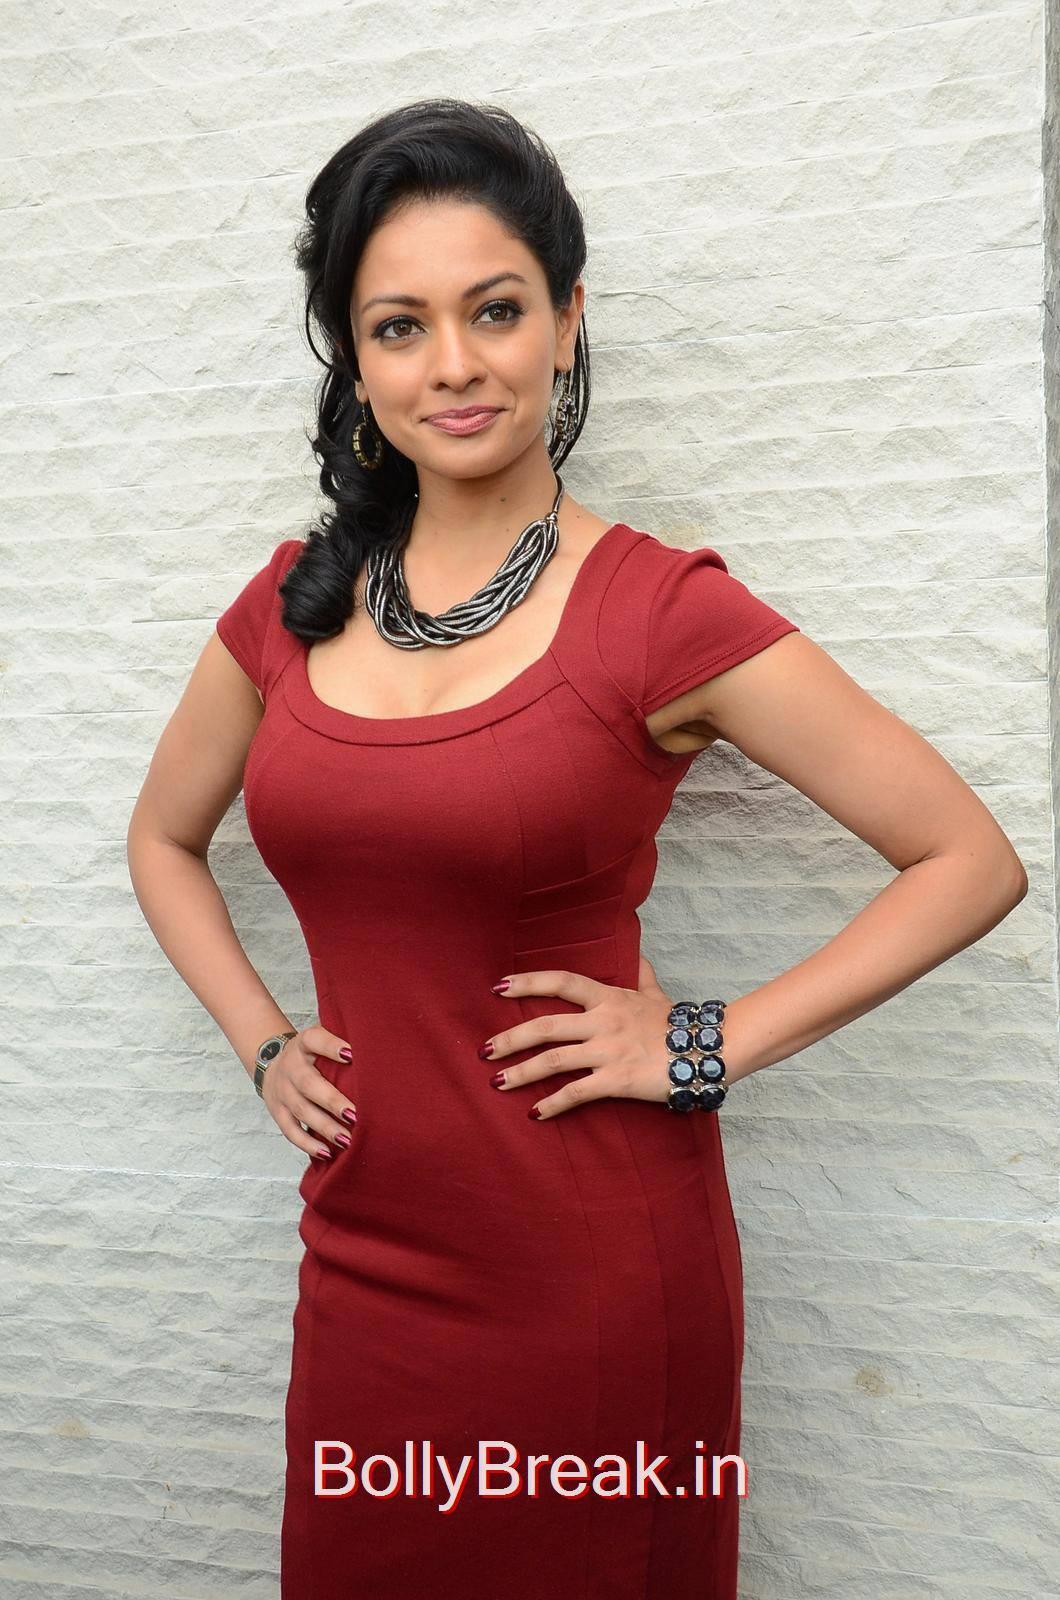 Pooja Kumar Photo Gallery with no Watermarks, Hot HD Images of Pooja Kumar from Uttama Villain Movie Release Date Press Meet